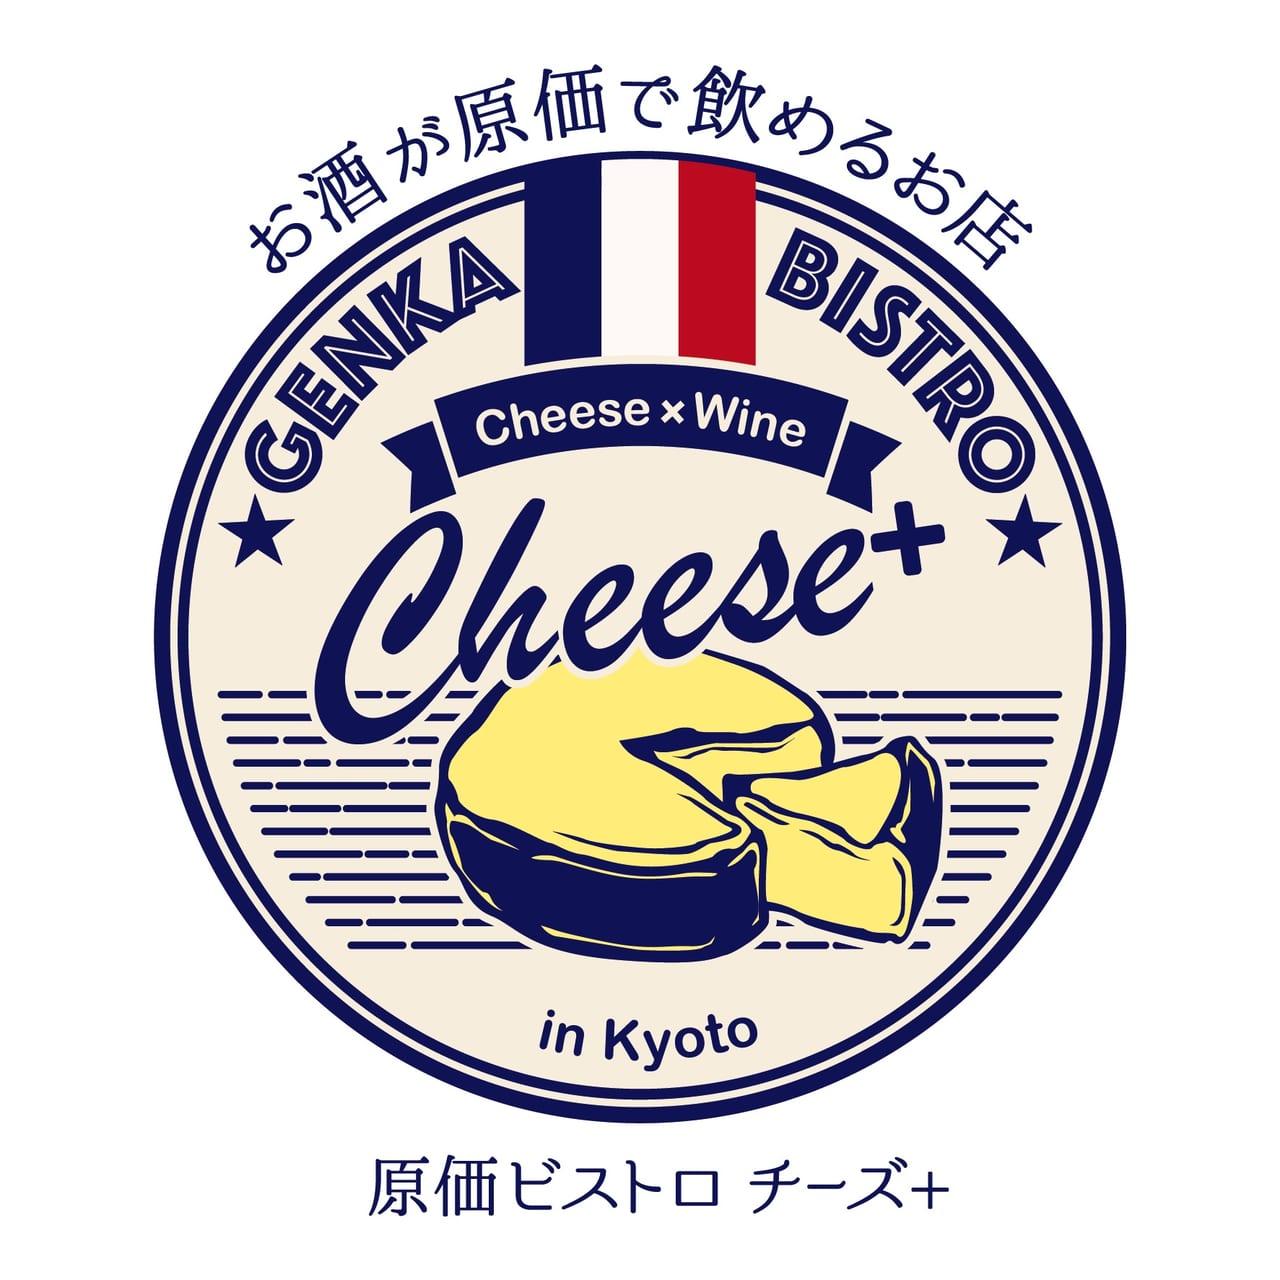 Genka bistro cheeseplus